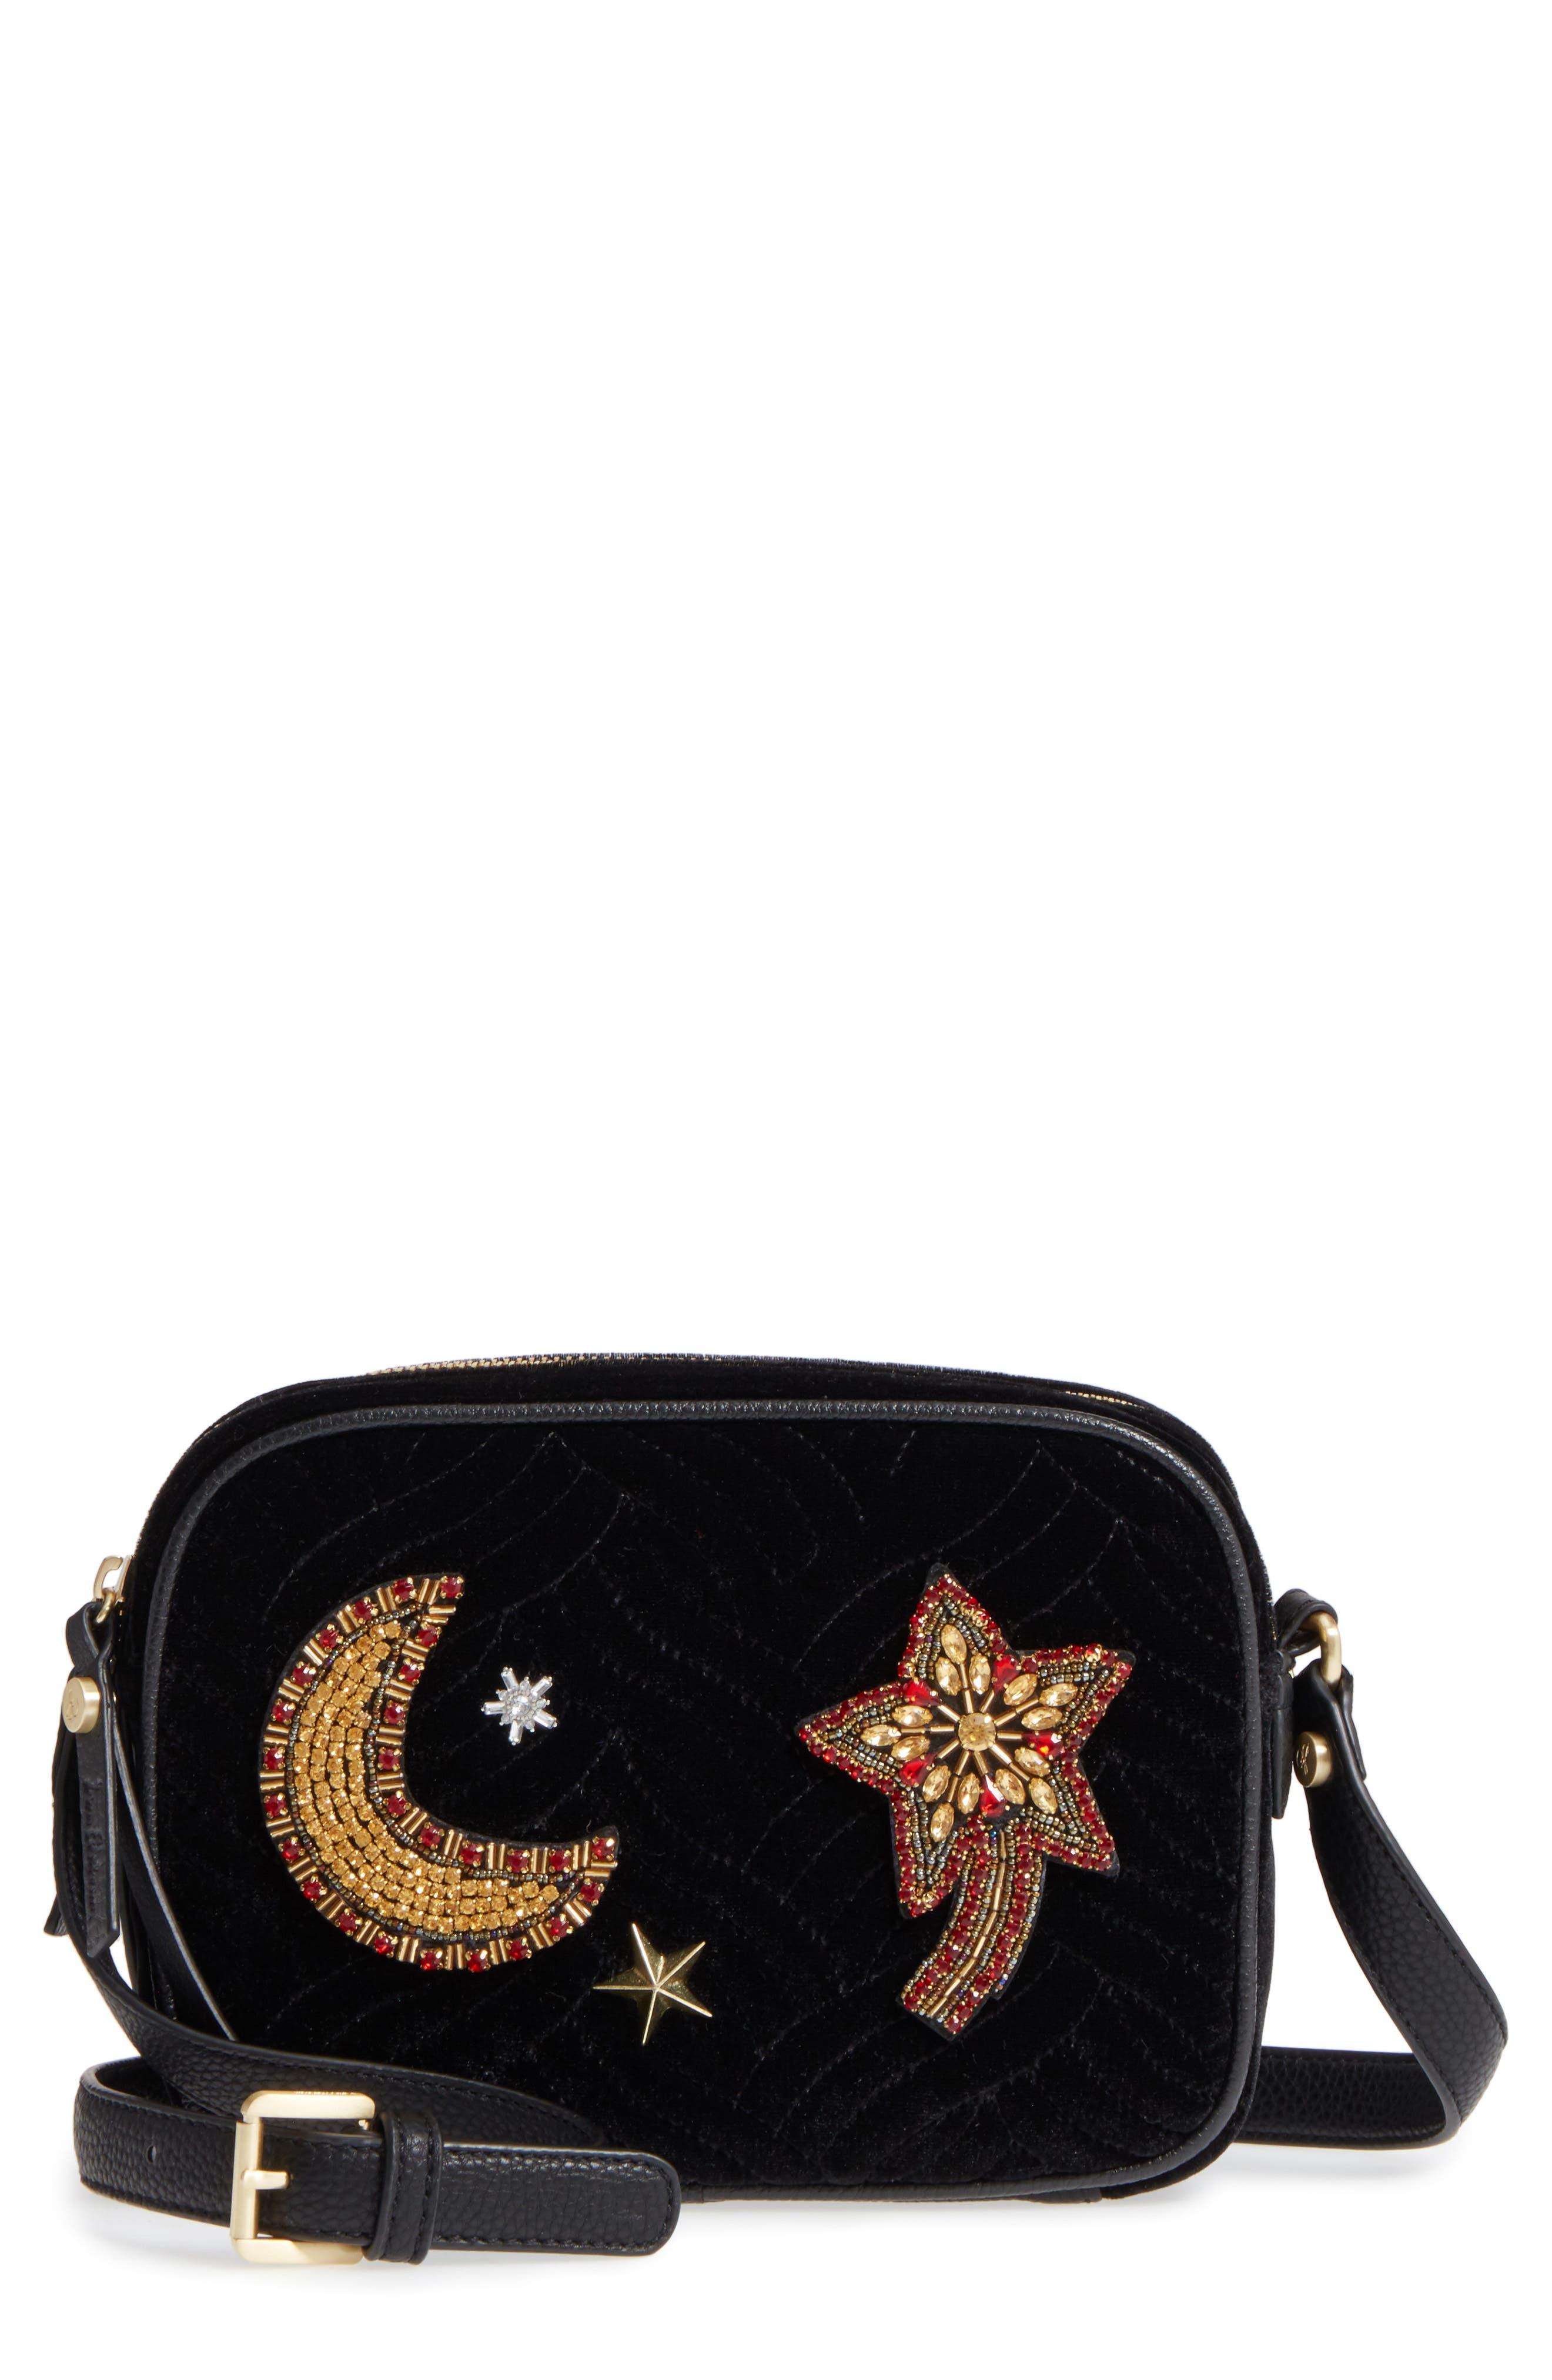 Perri Velvet Camera Crossbody Bag,                             Main thumbnail 1, color,                             Black Moon/ Star